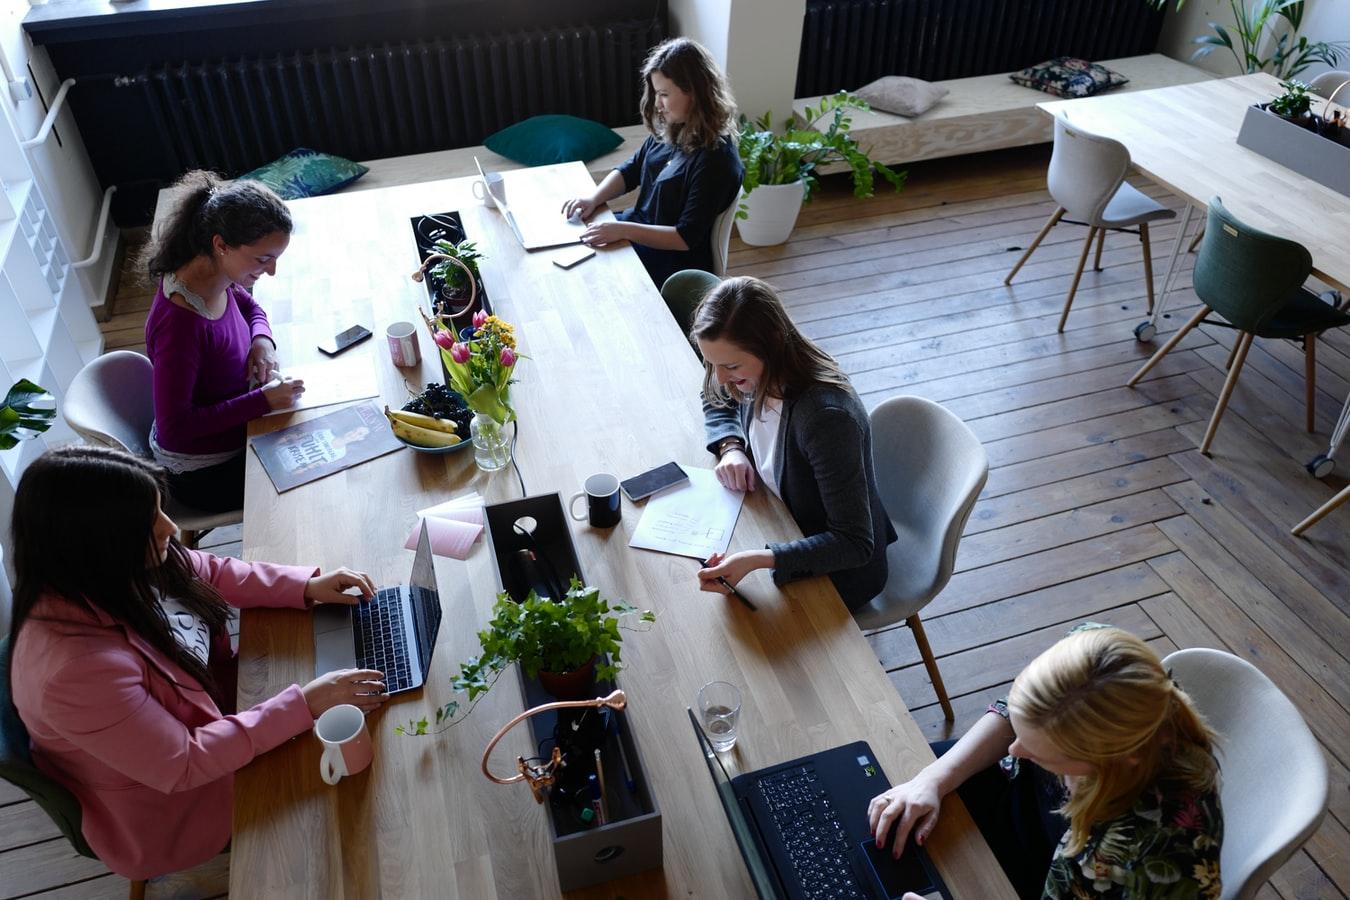 People sitting around a desk working